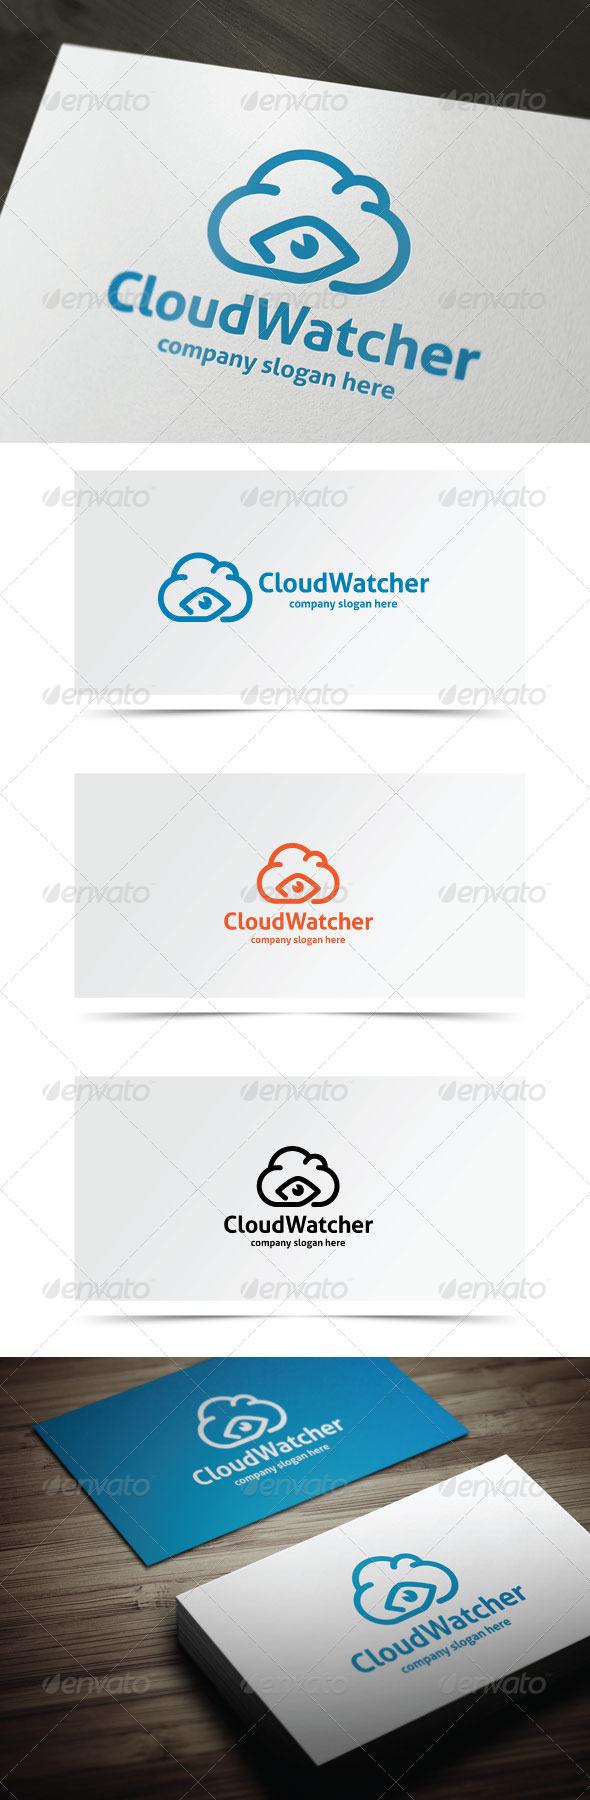 Cloud Watcher - Objects Logo Templates